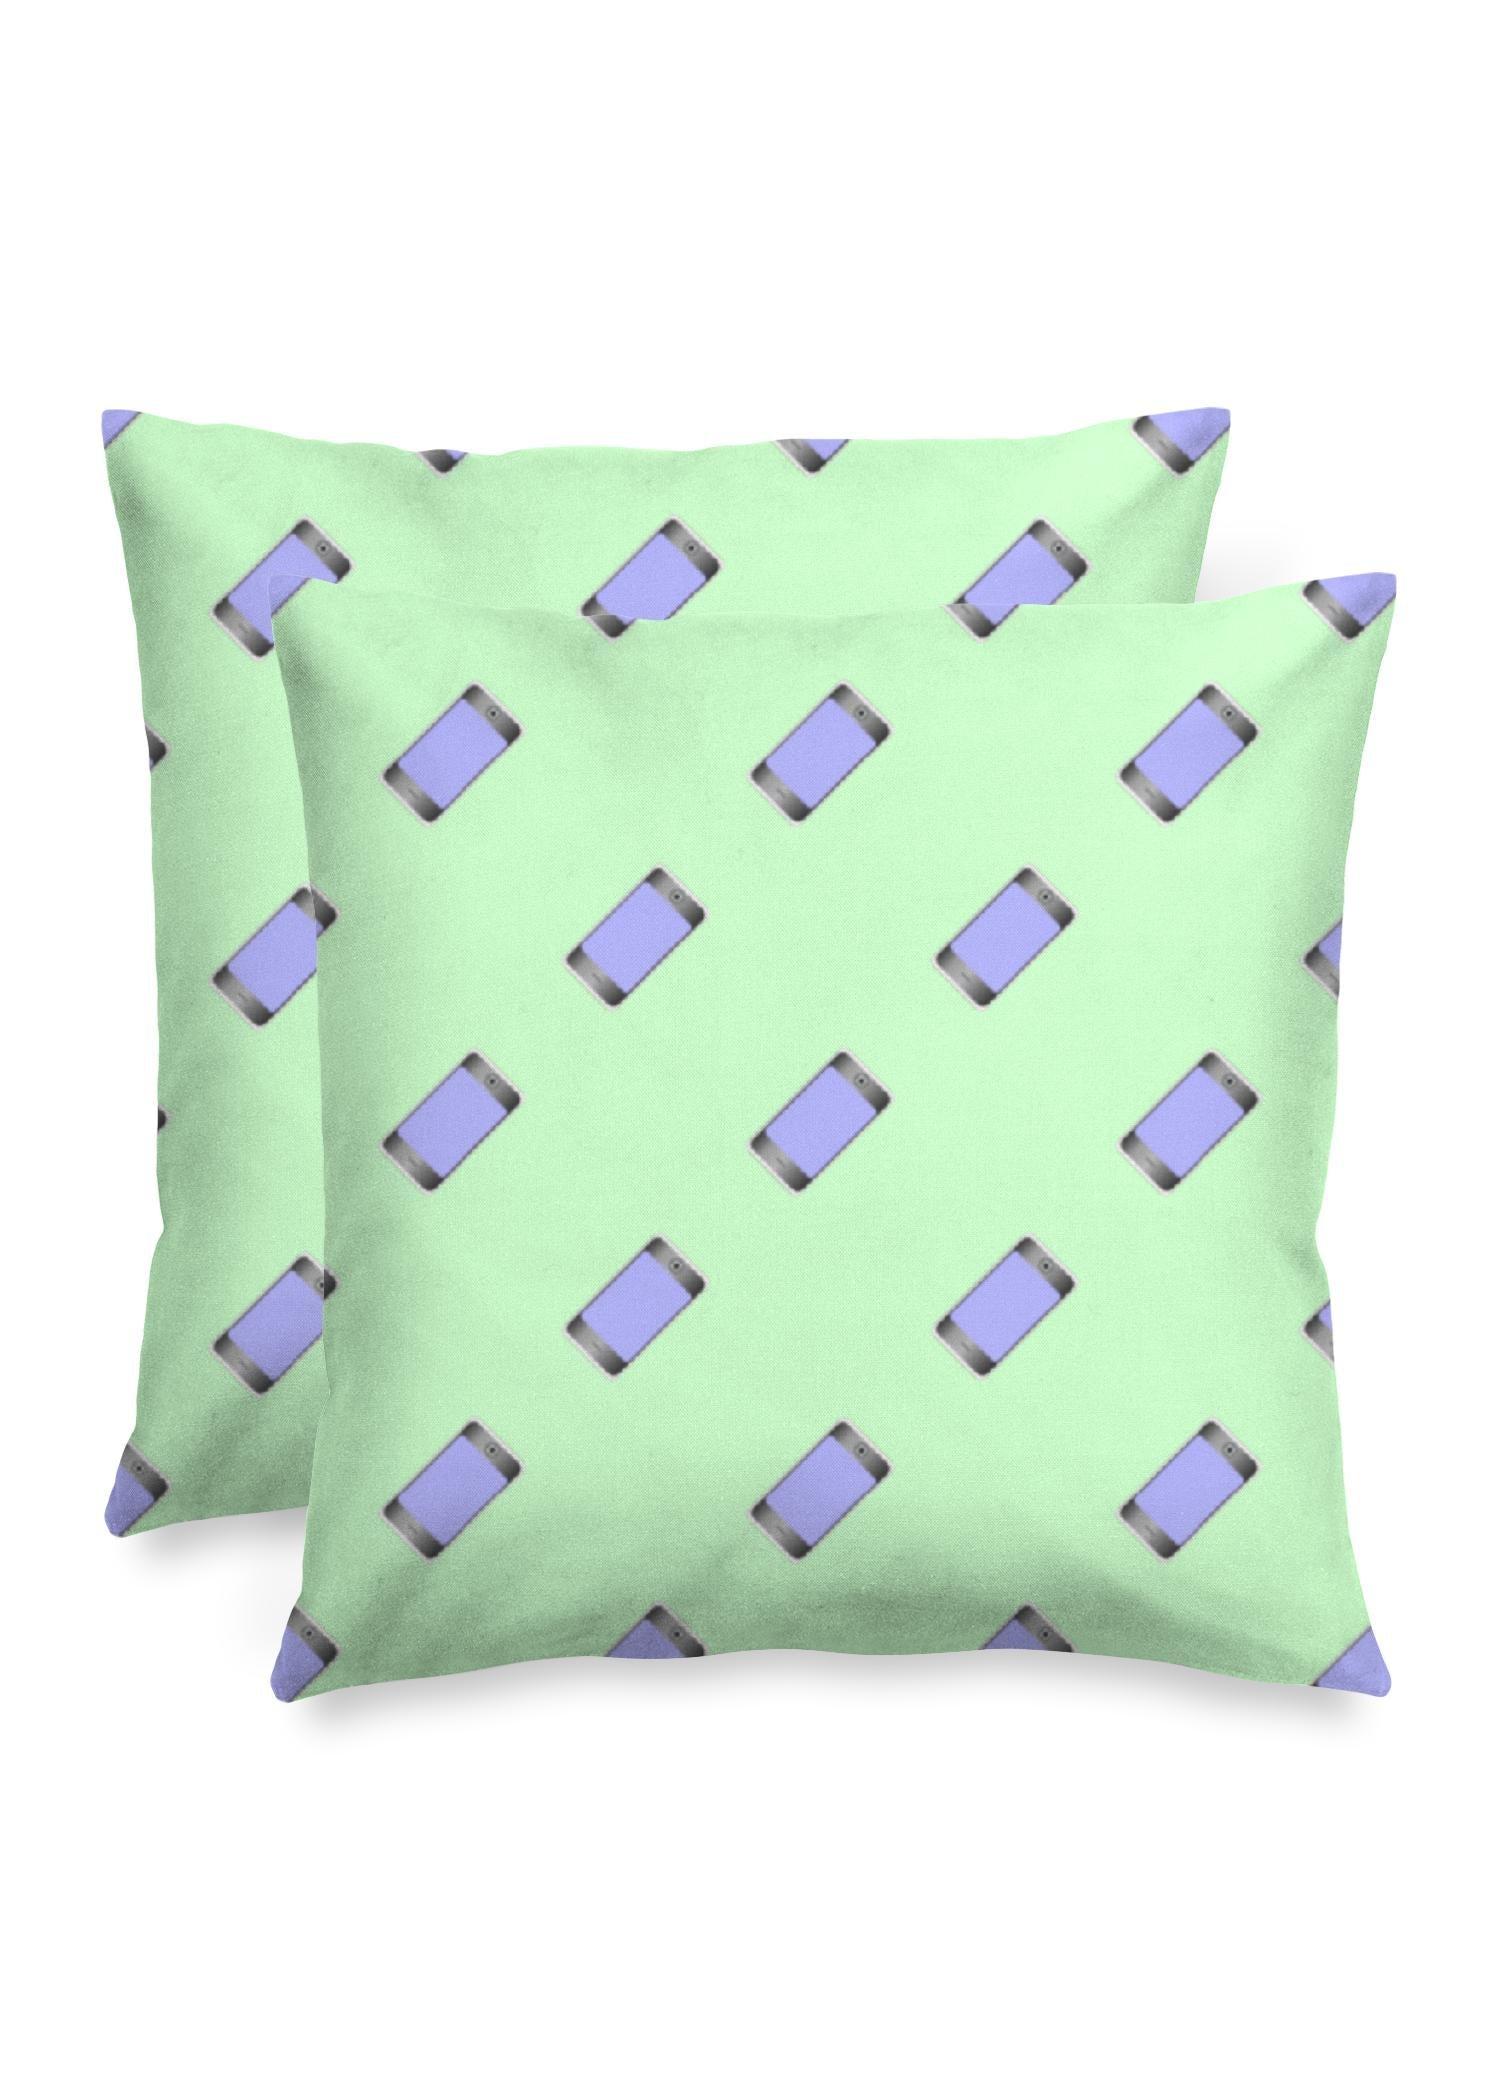 "VIDA Square Pillow - Mobile Phones On Green in Green by VIDA Original Artist  - Size: Matte / 20"" / Set"